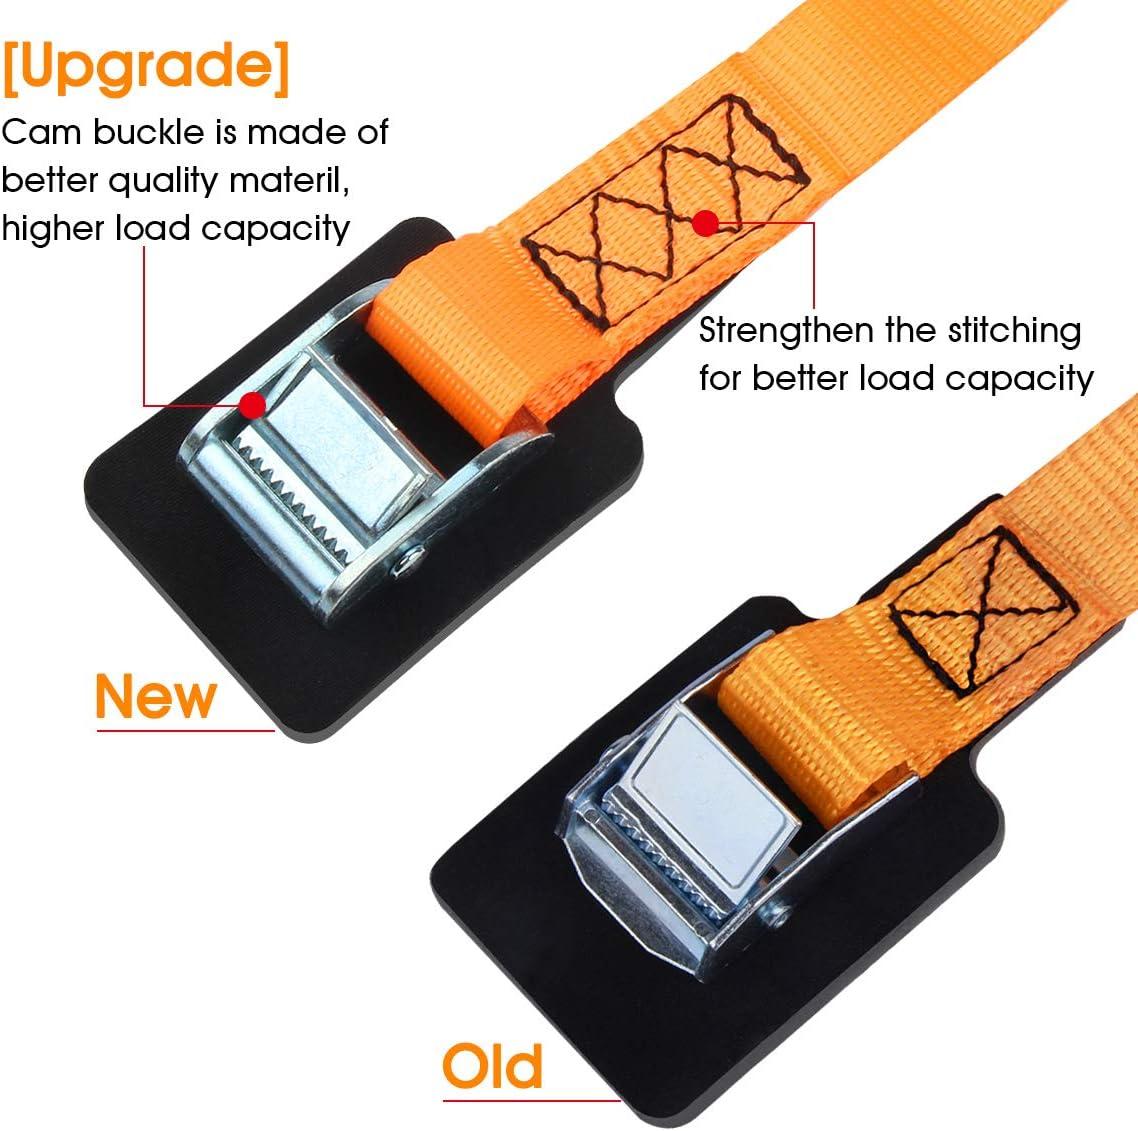 4-Pack JCHL Lashing Straps Sturdy 1 x 20 Tie Down Strap Cargo Tie-Down Strap Padded Cam Lock Buckle 1000lbs Capacity